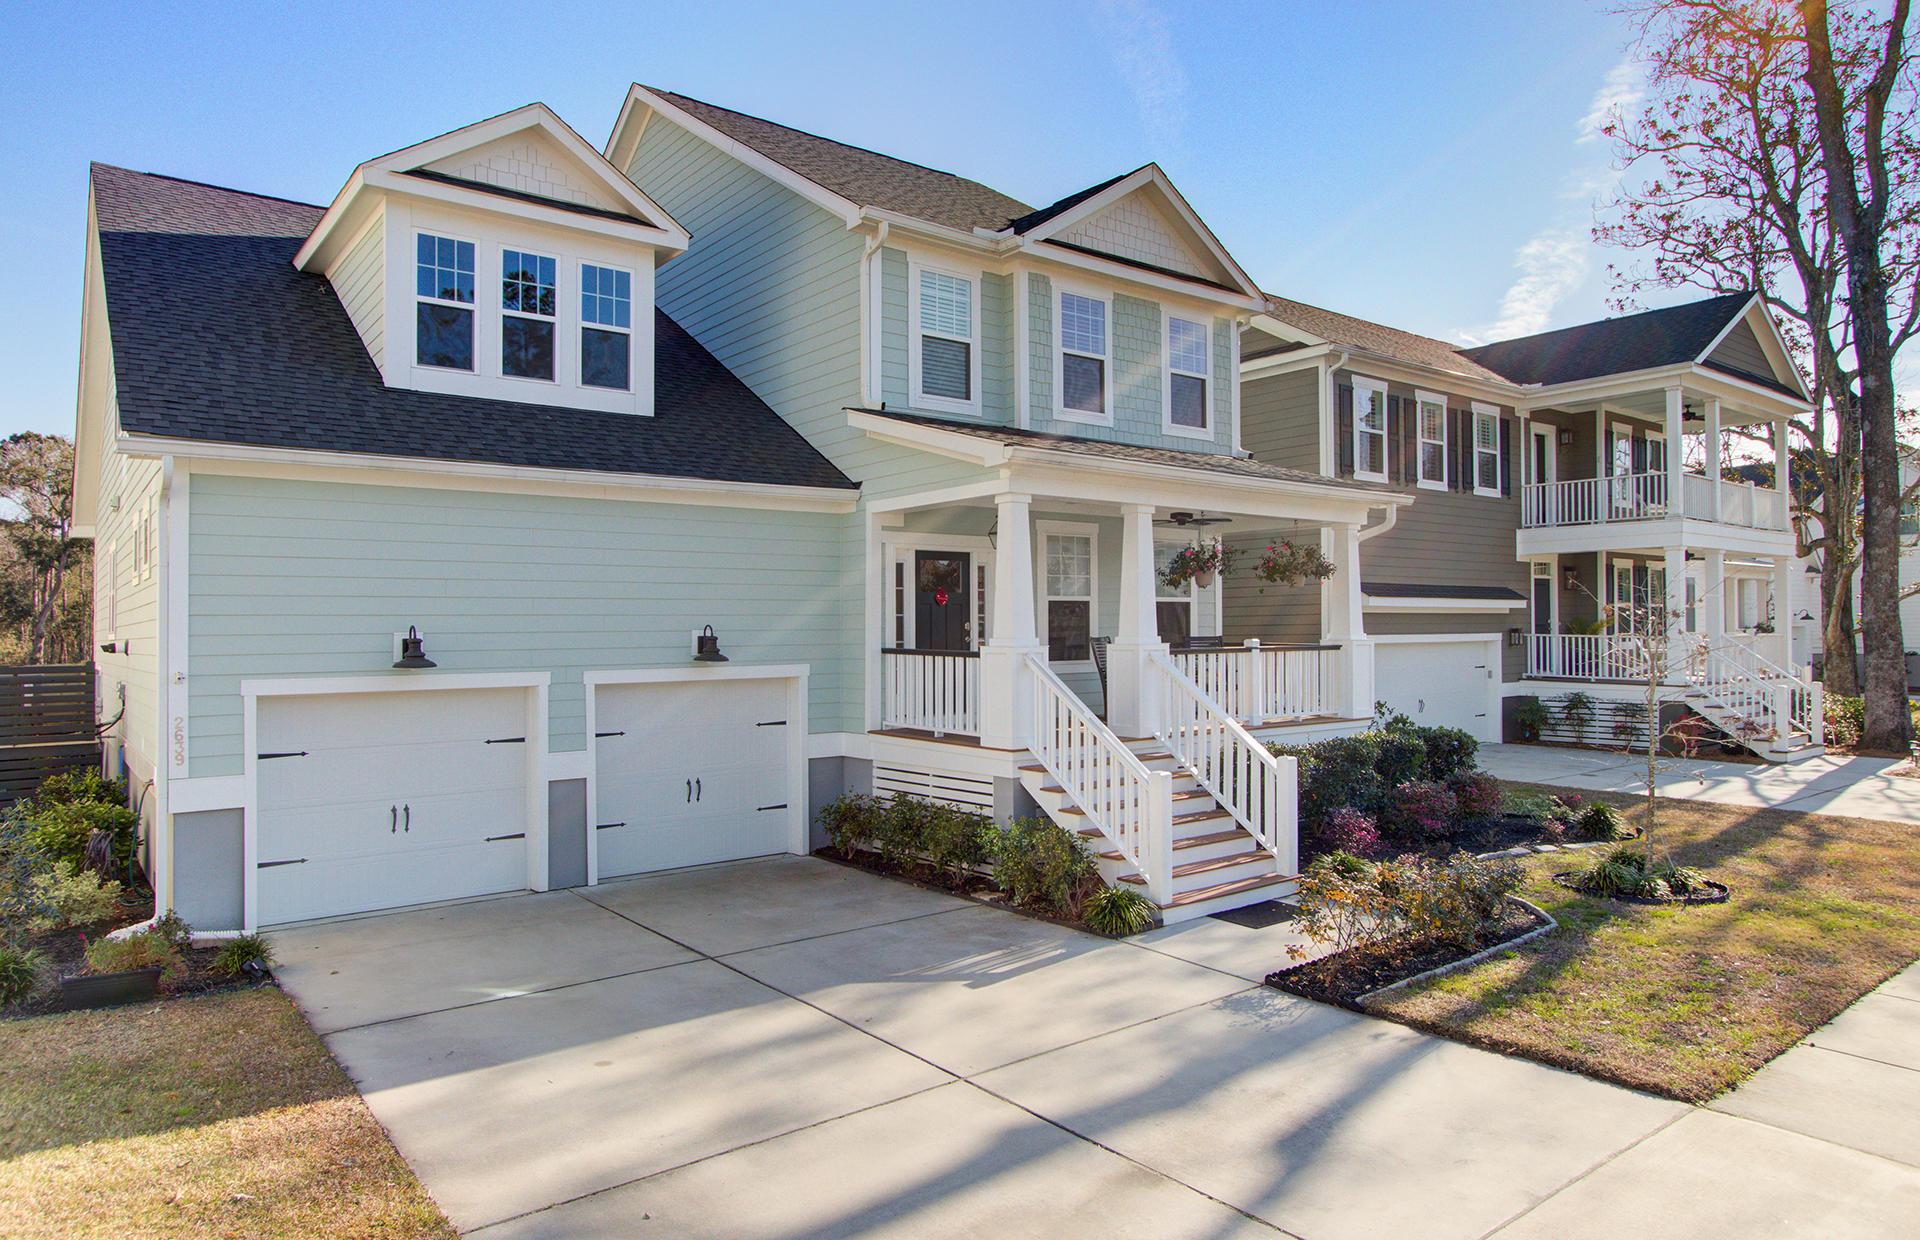 Stonoview Homes For Sale - 2639 Colonel Harrison, Johns Island, SC - 0